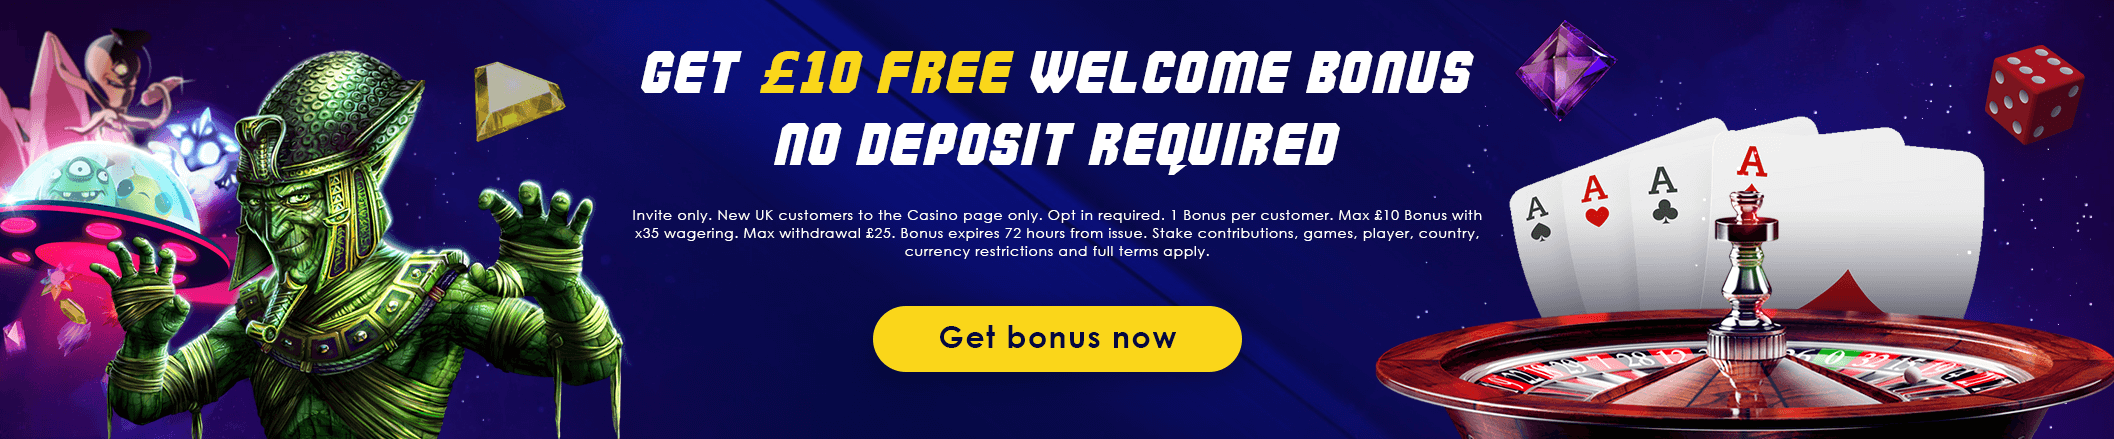 Get £10 Free Welcome Bonus No deposit required